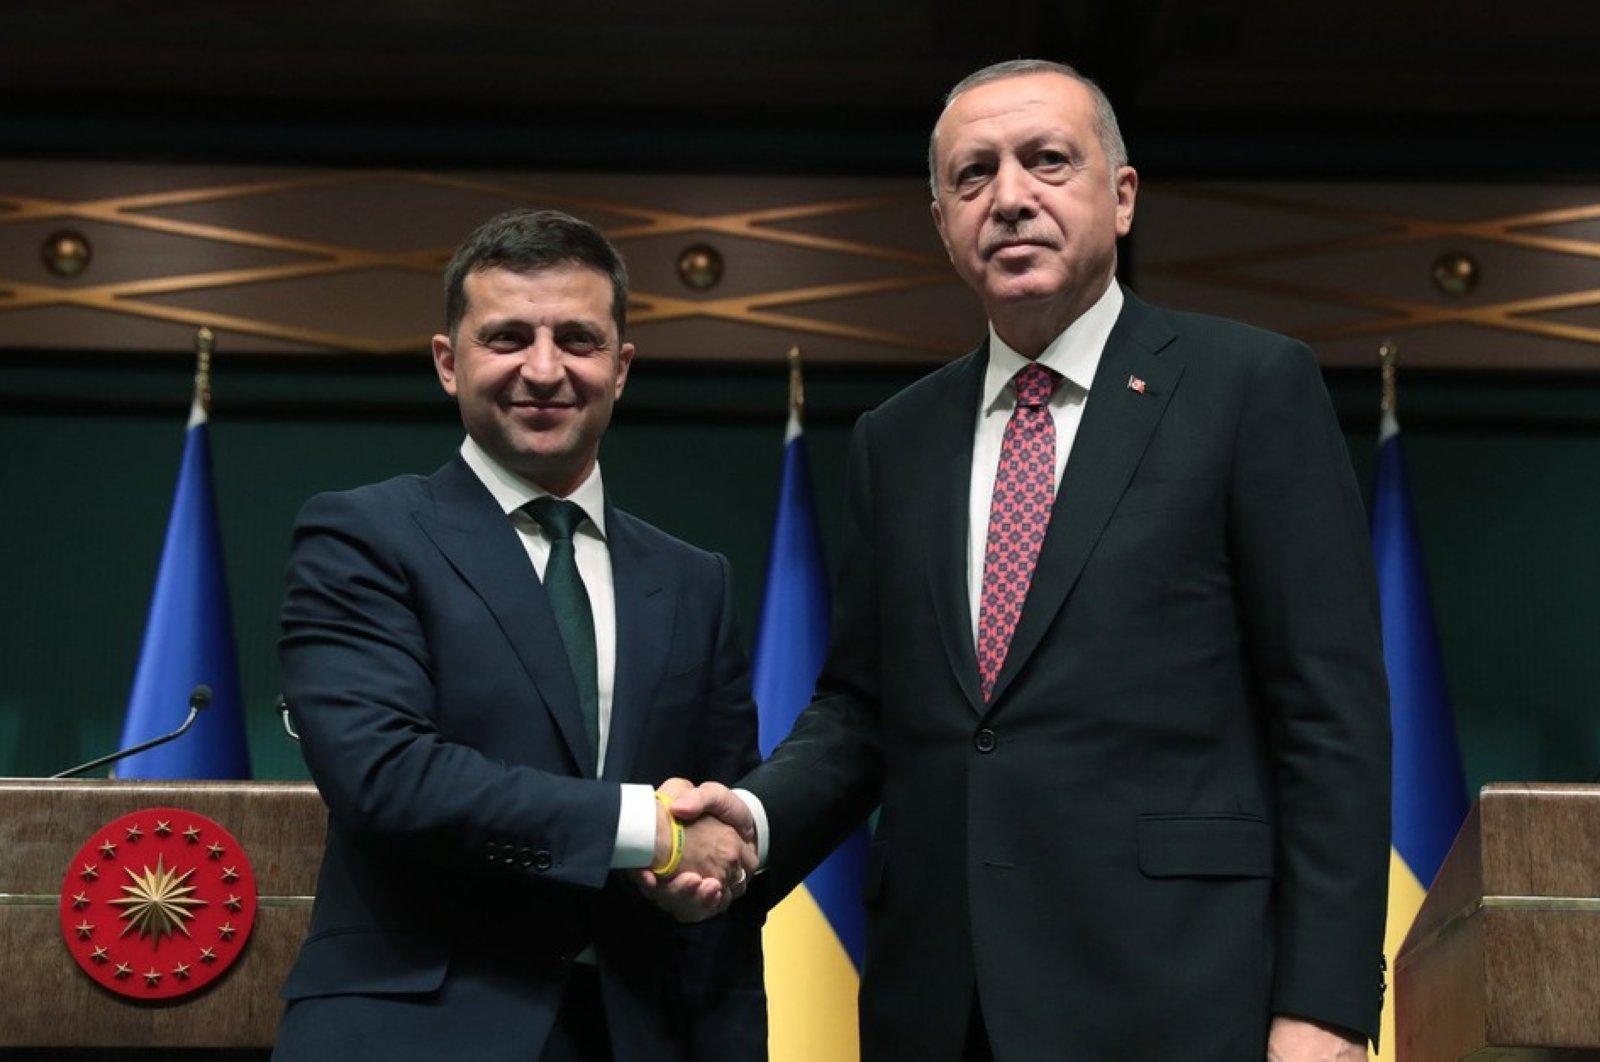 President Recep Tayyip Erdoğan (R) and his Ukrainian counterpart Volodymyr Zelensky shake hands after joint press conference, Ankara, Aug. 7, 2019 (Sabah File Photo)